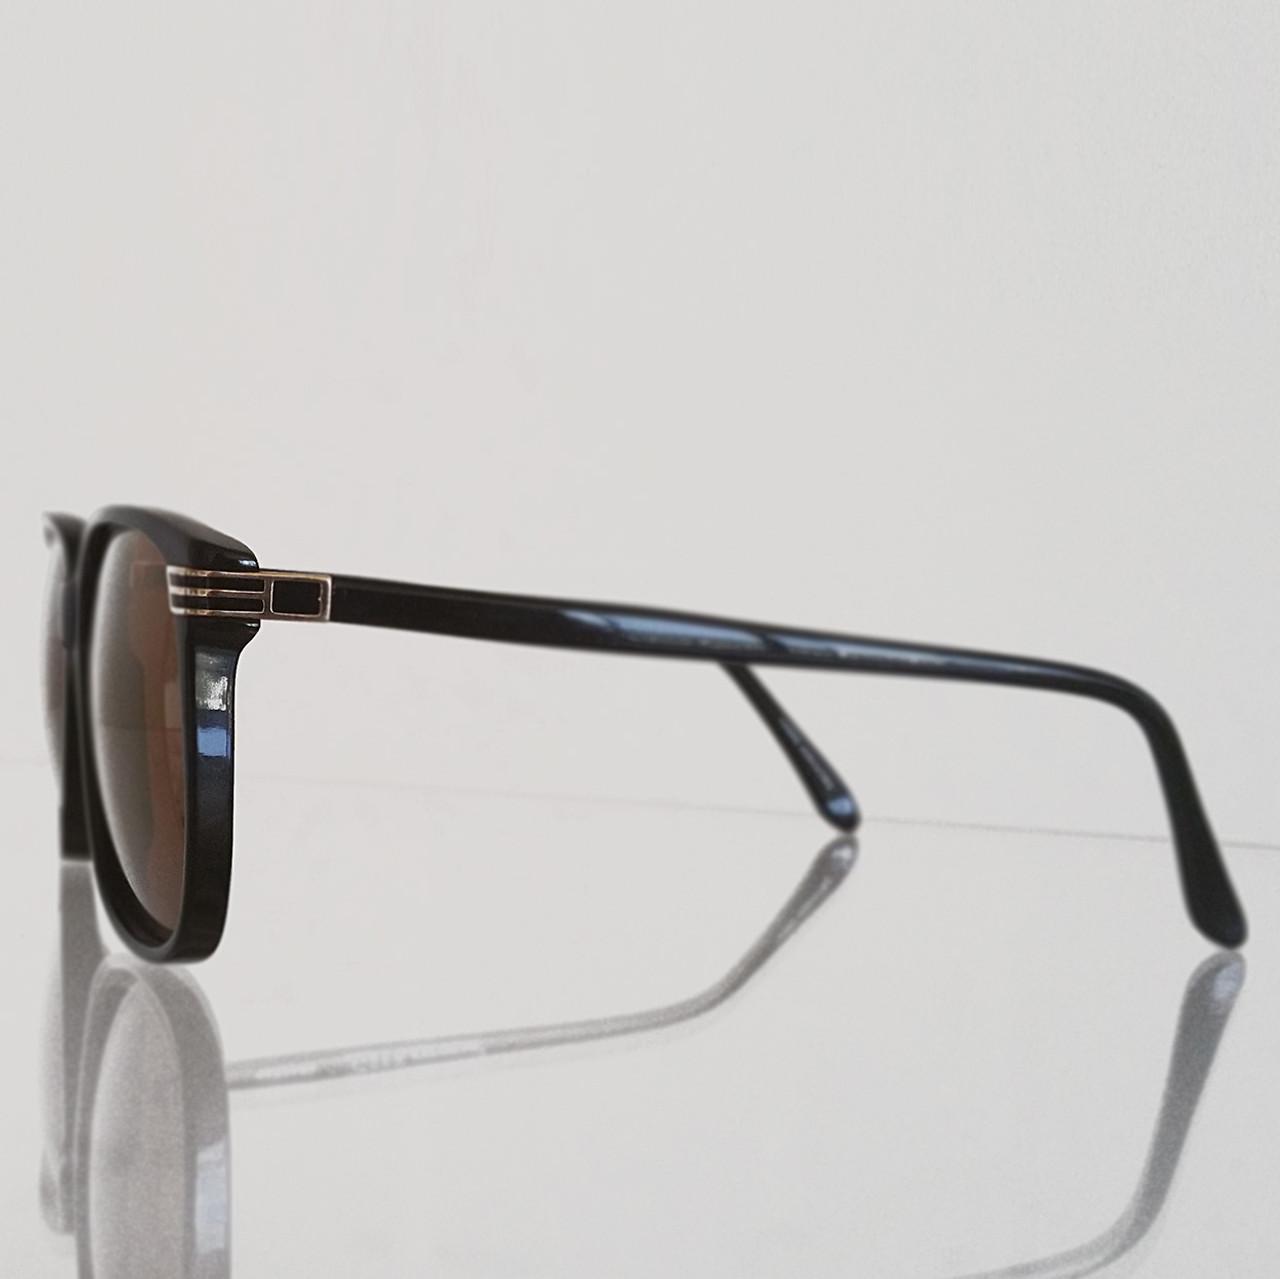 GEEK Eyewear Couture Line style Corranado